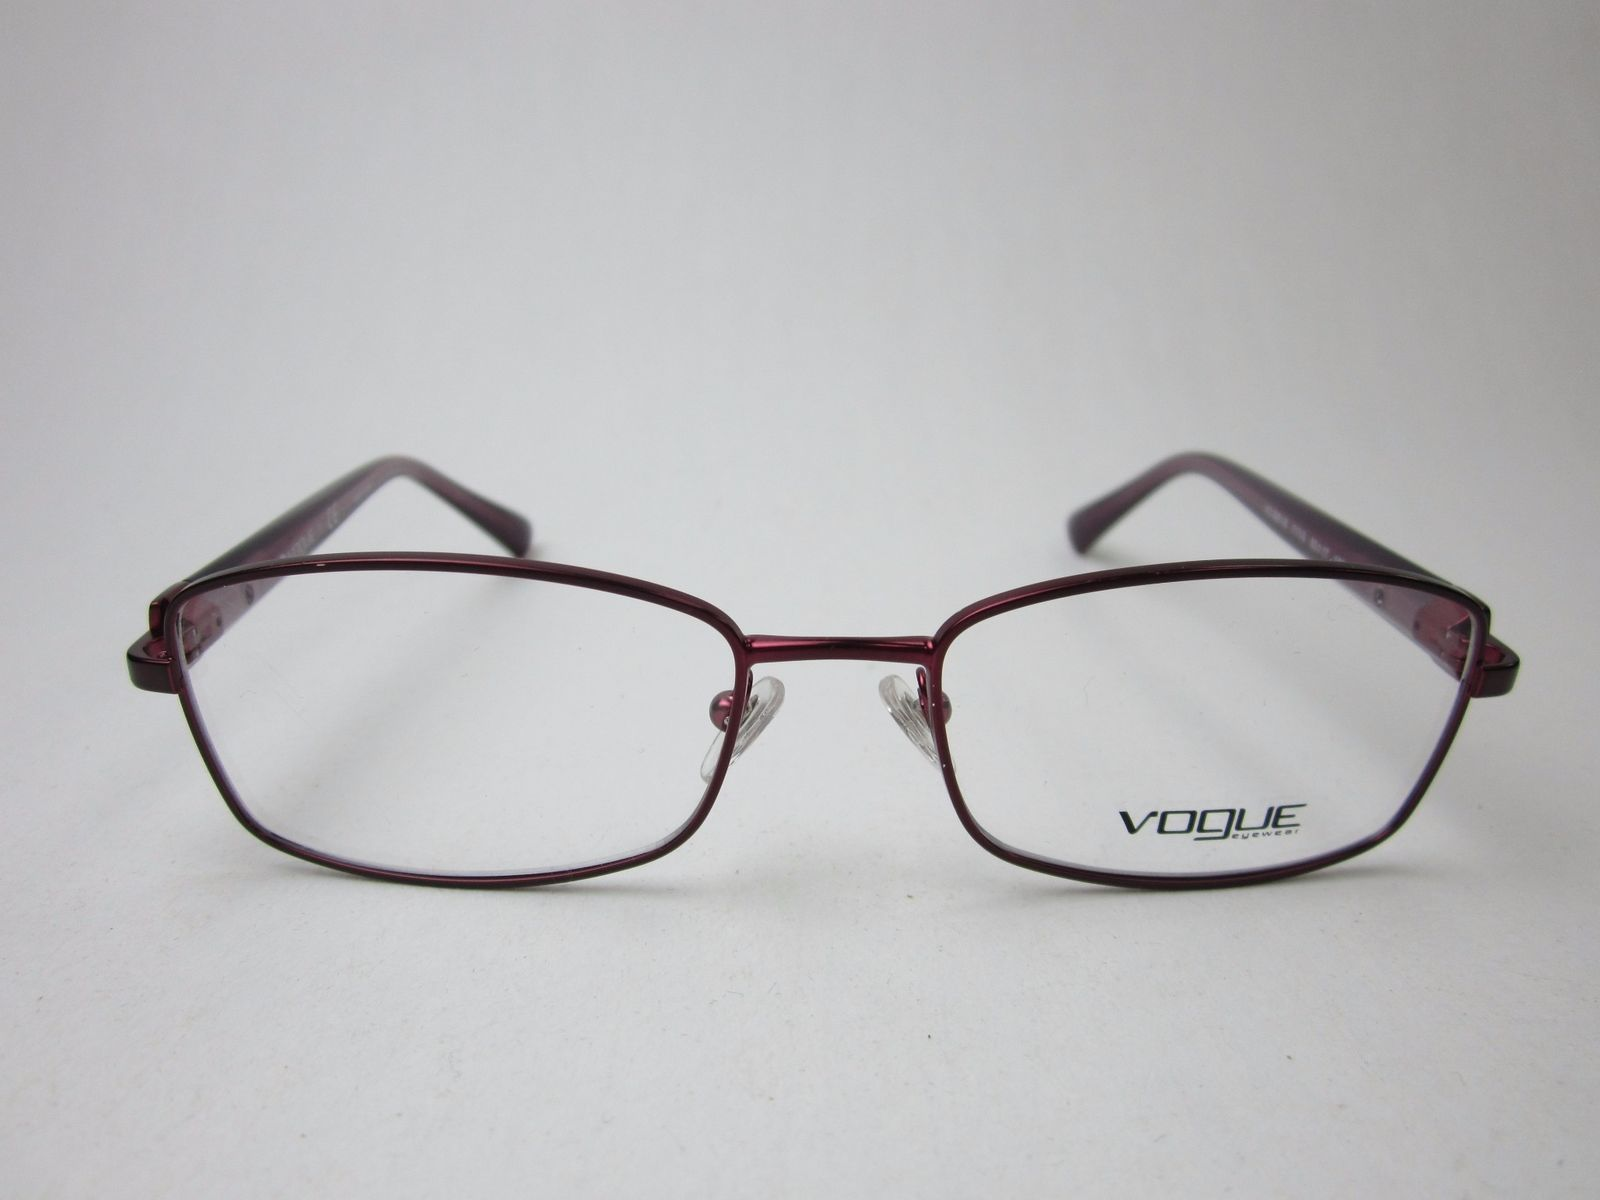 98ffbdfe9dbde9 Vogue VO3961-B 717-S Eyeglasses 52 17 135 and 50 similar items